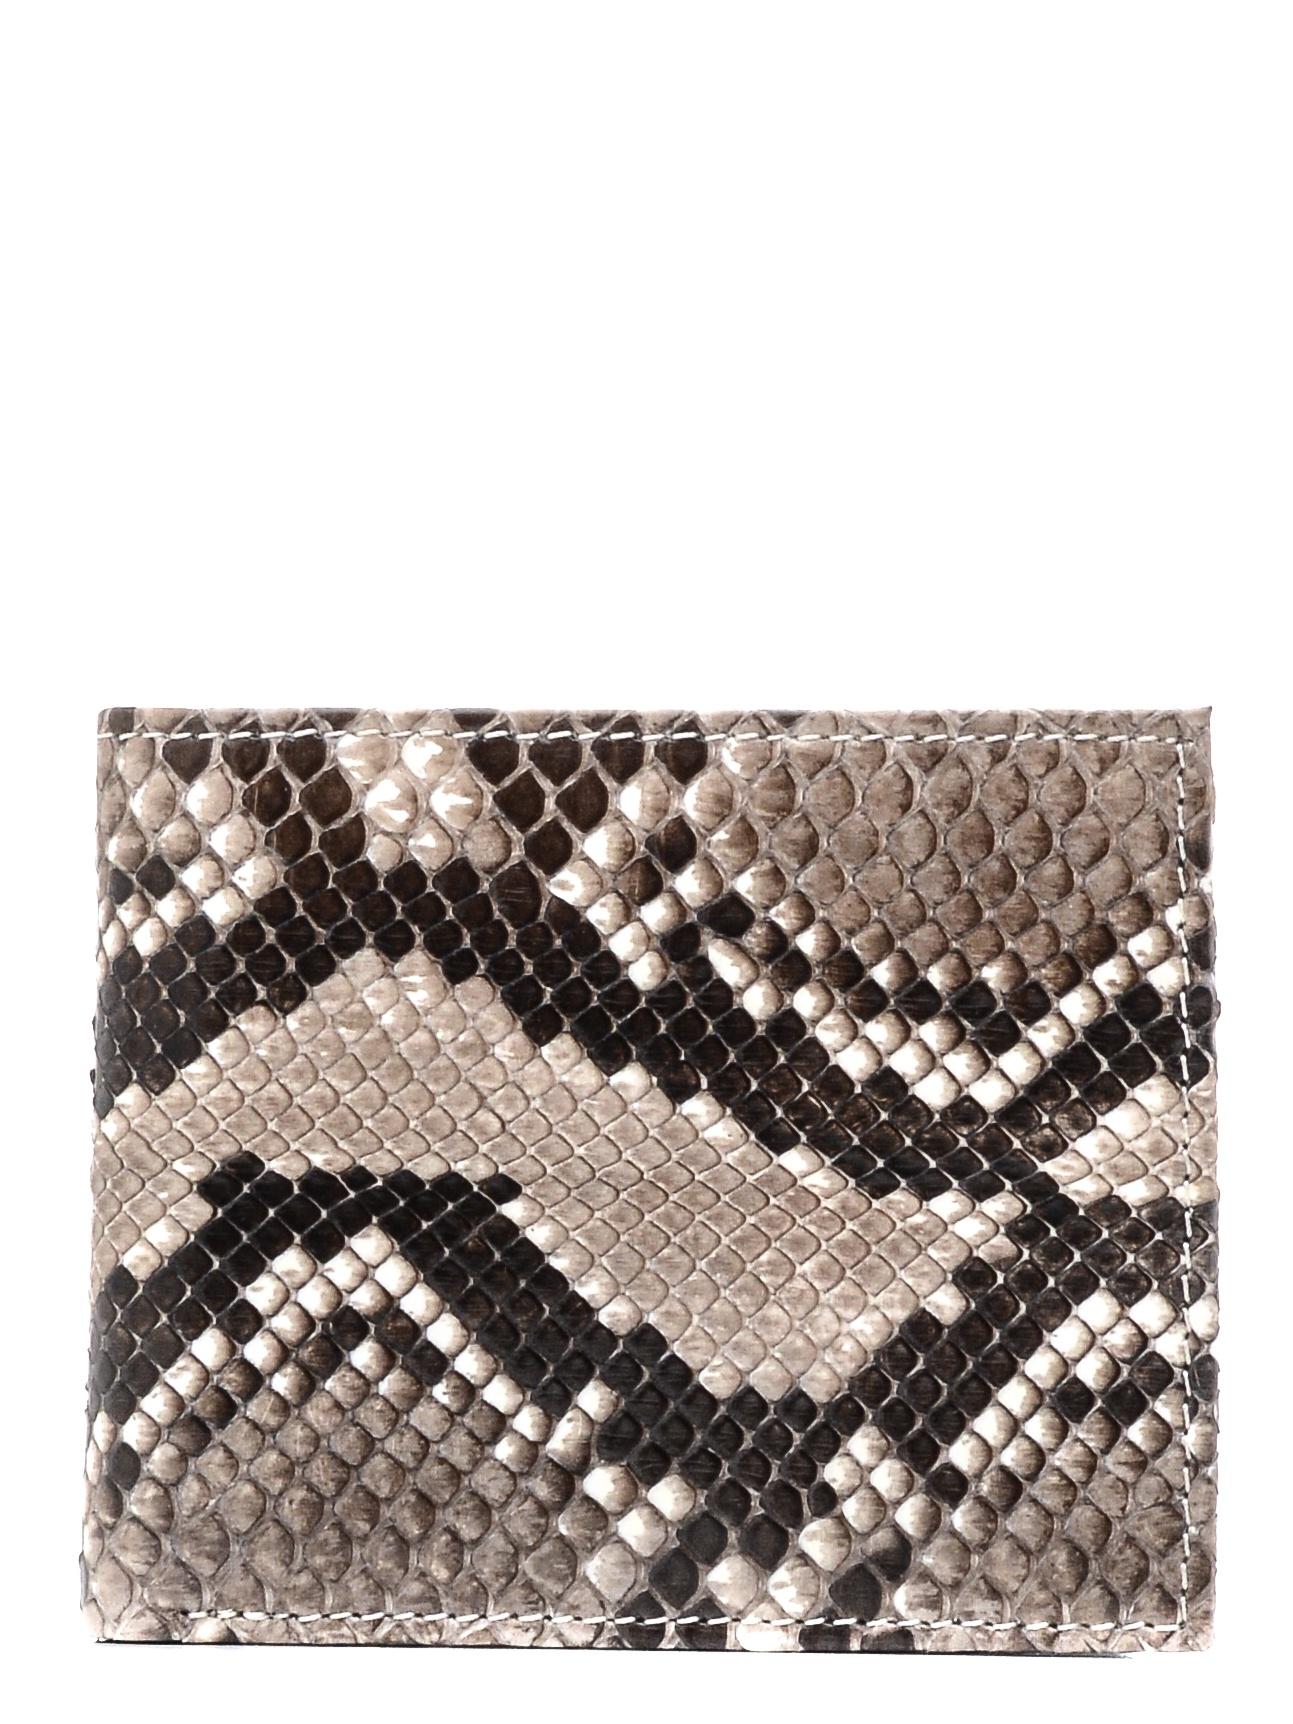 Кошелек ExoticLux из кожи питона, серый цены онлайн